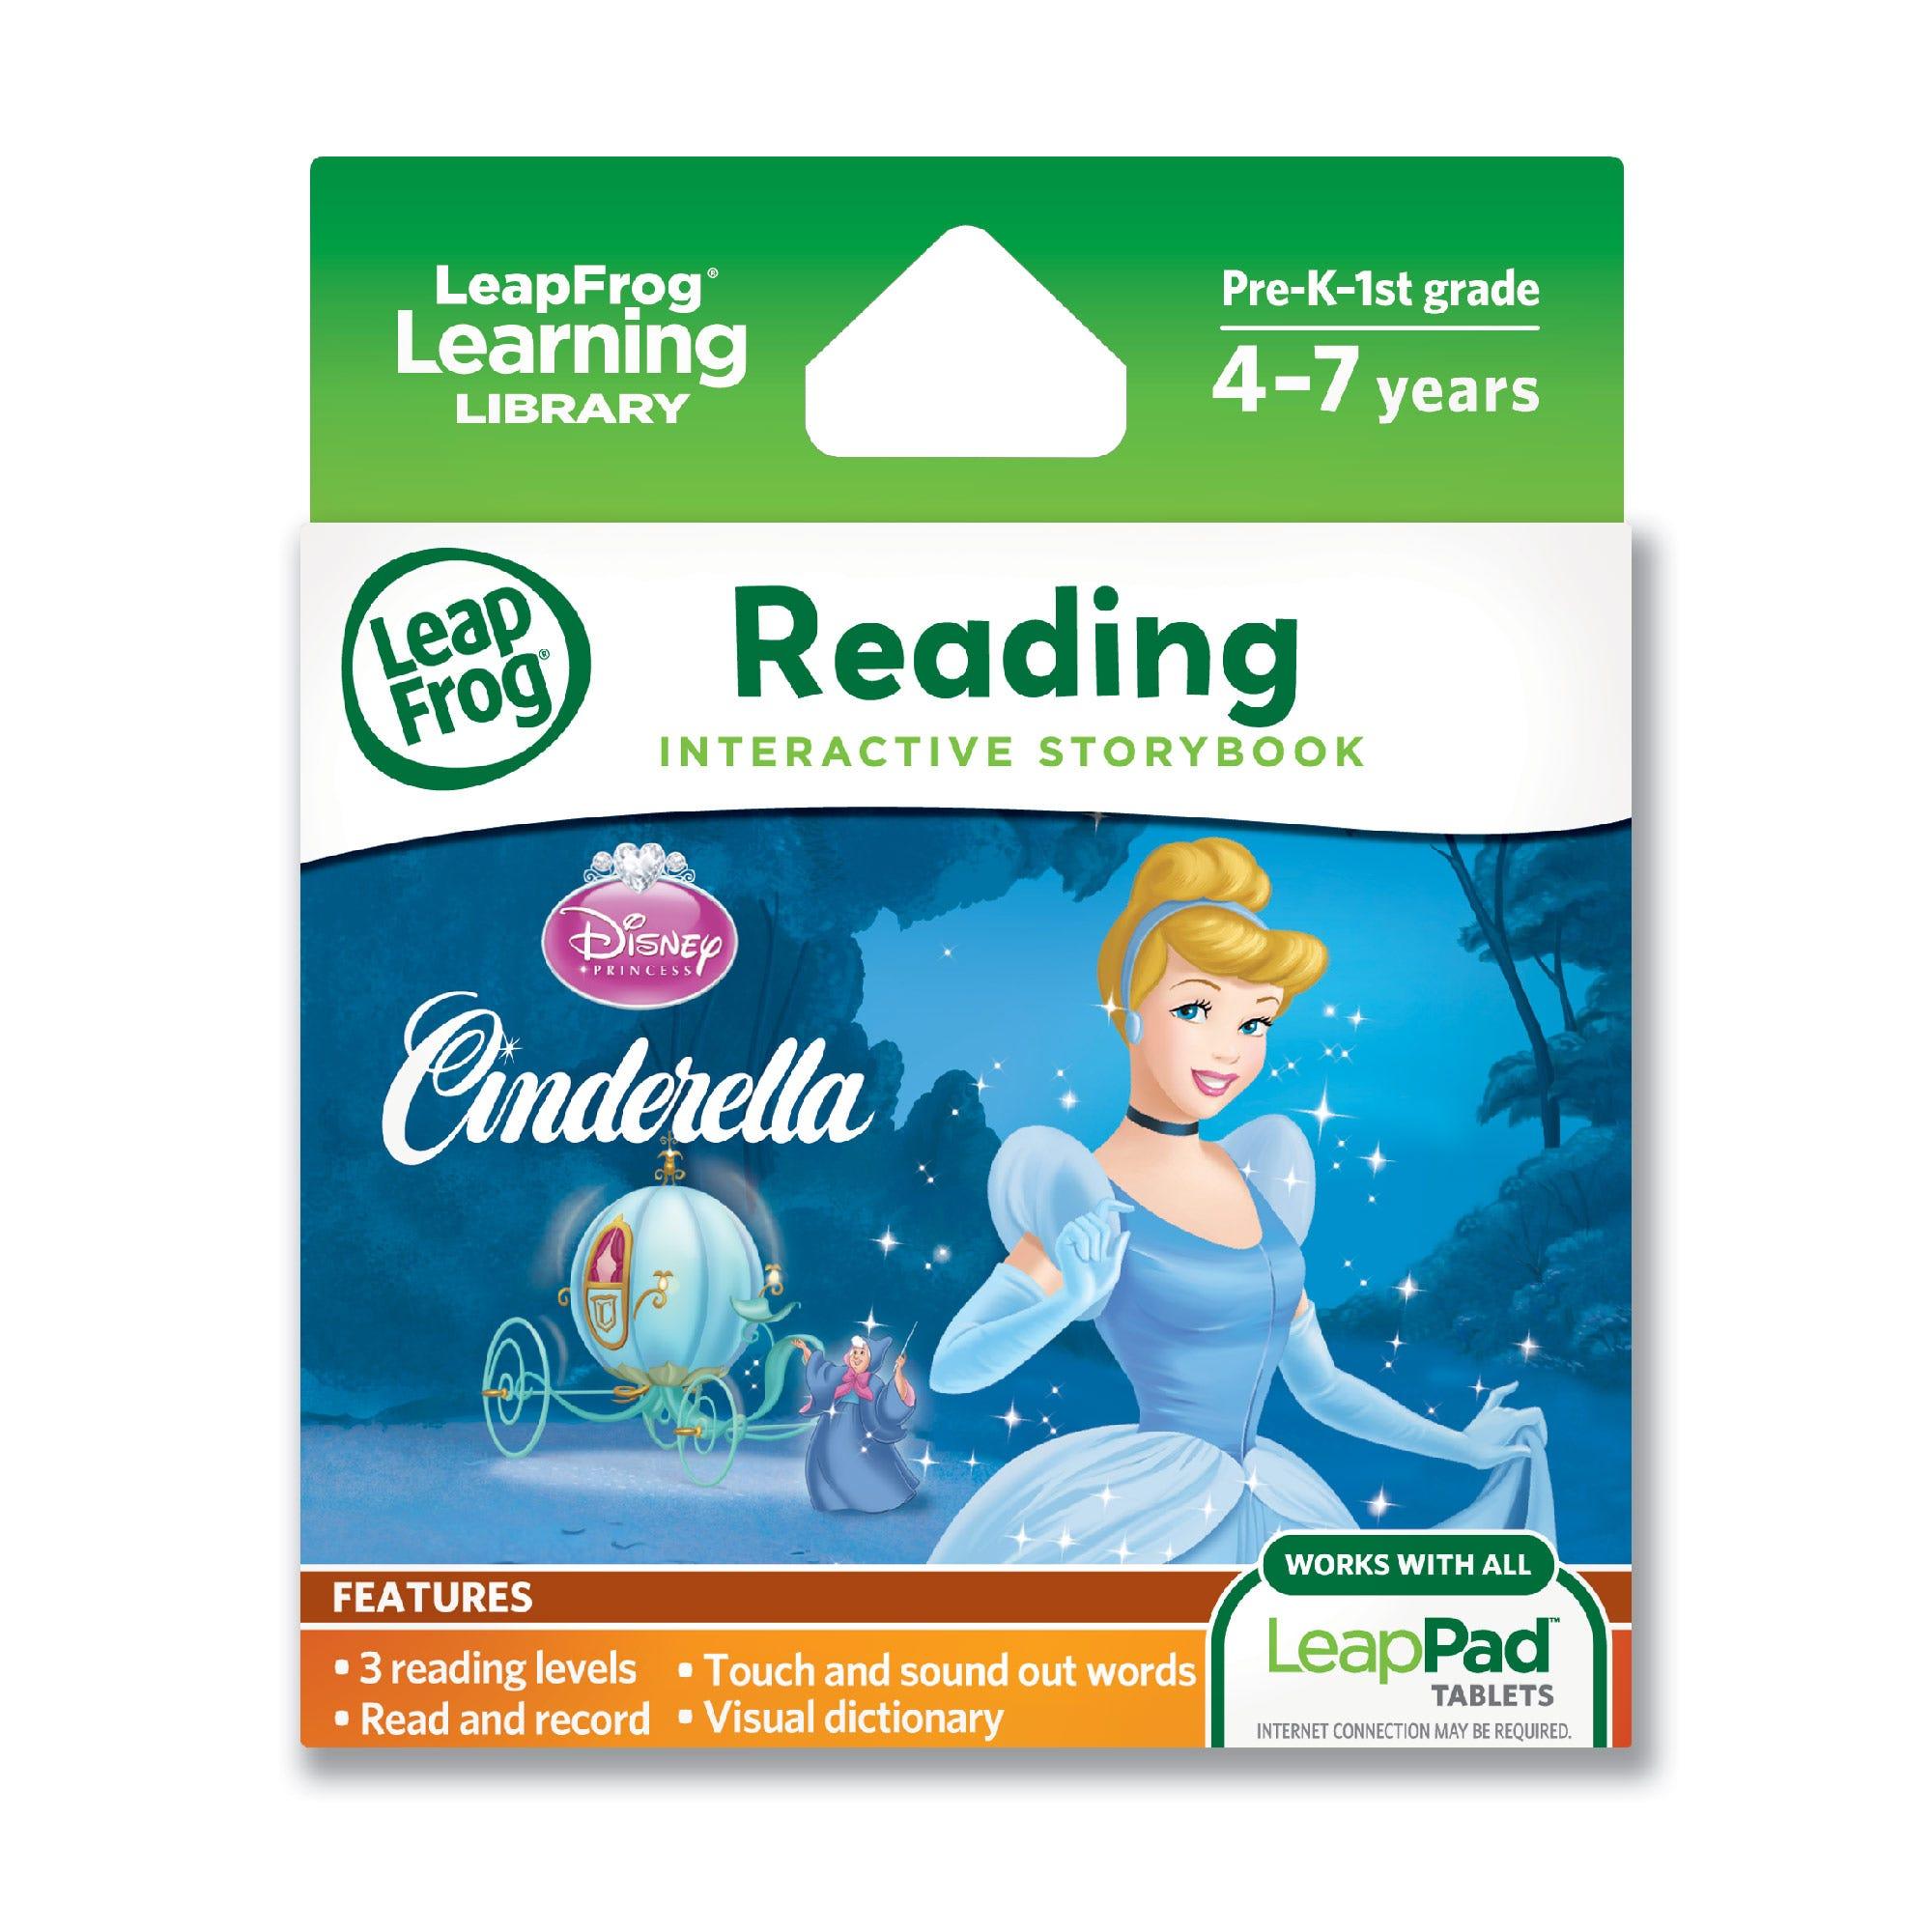 LeapFrog Disney Princess Cinderella Interactive Storybook